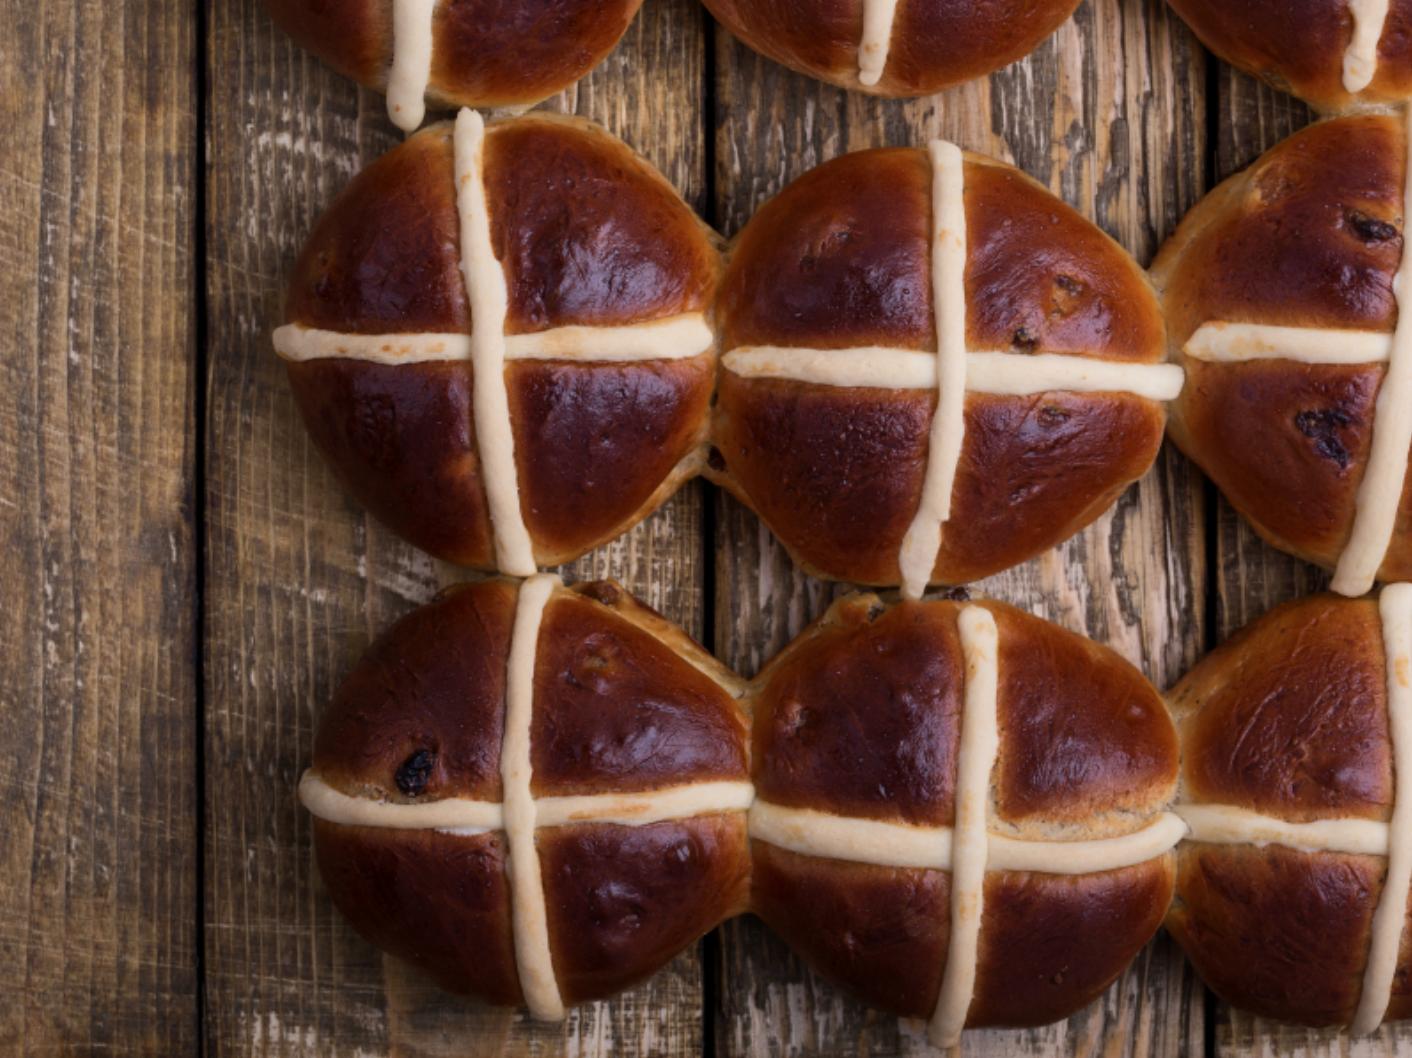 hot cross buns sitting on cutting board